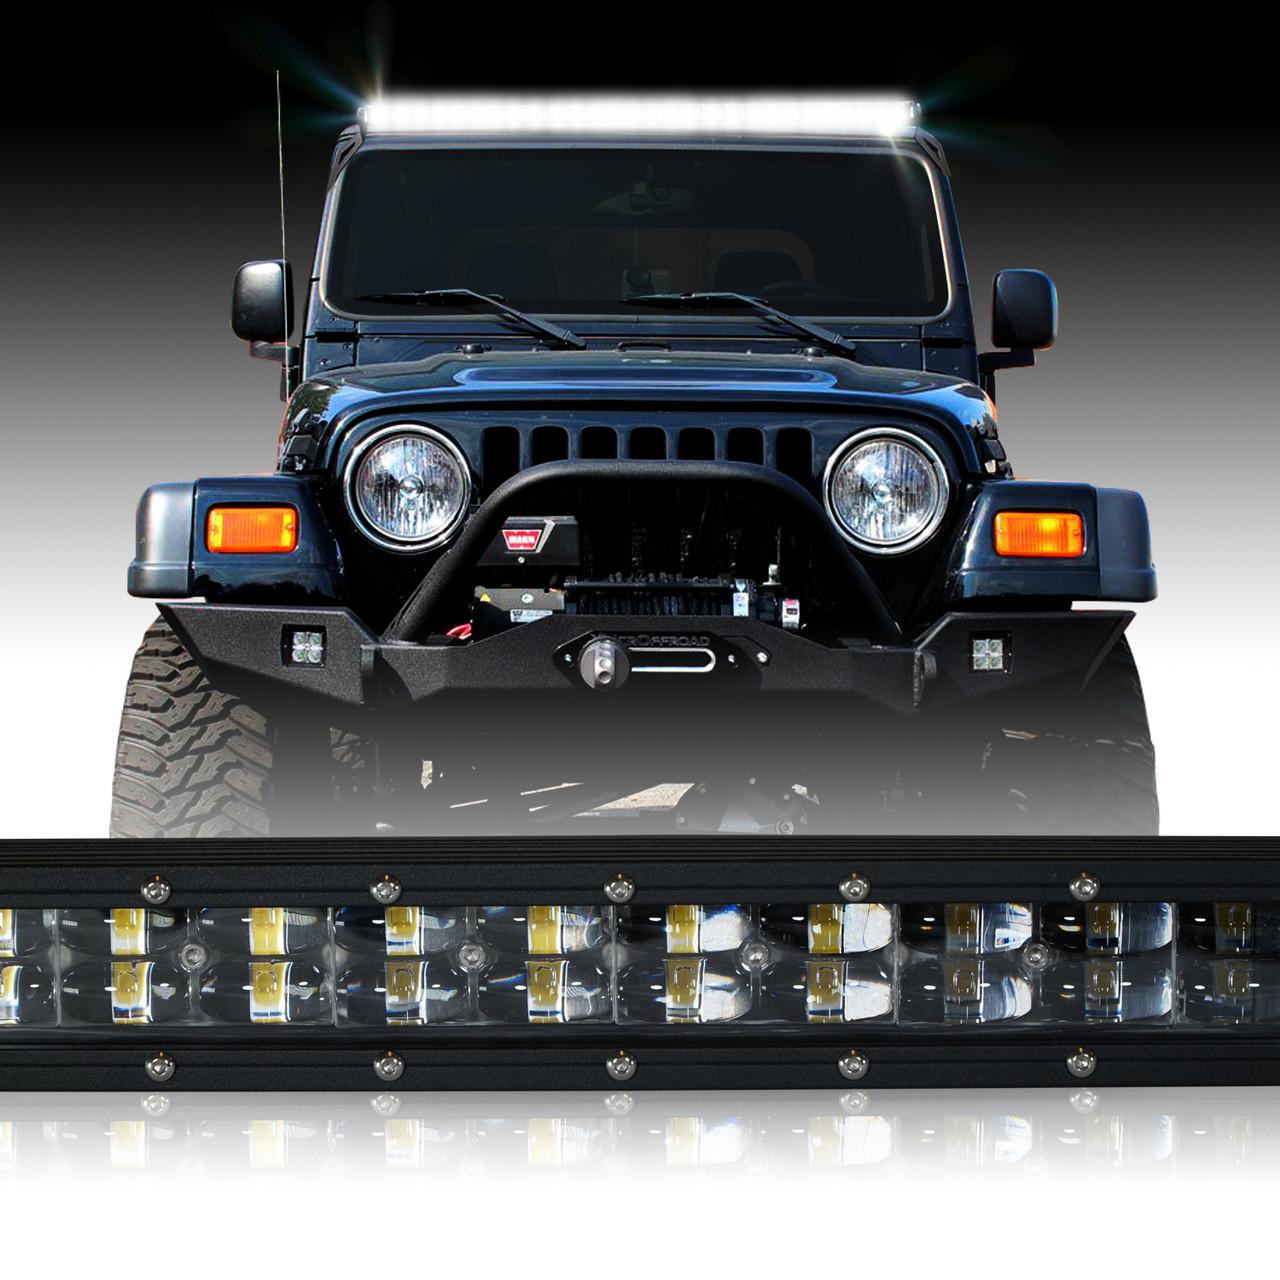 2000 jeep wrangler wiring harness electrical wiring diagrams jeep tj dash jeep tj rear wiper wiring [ 1280 x 1280 Pixel ]